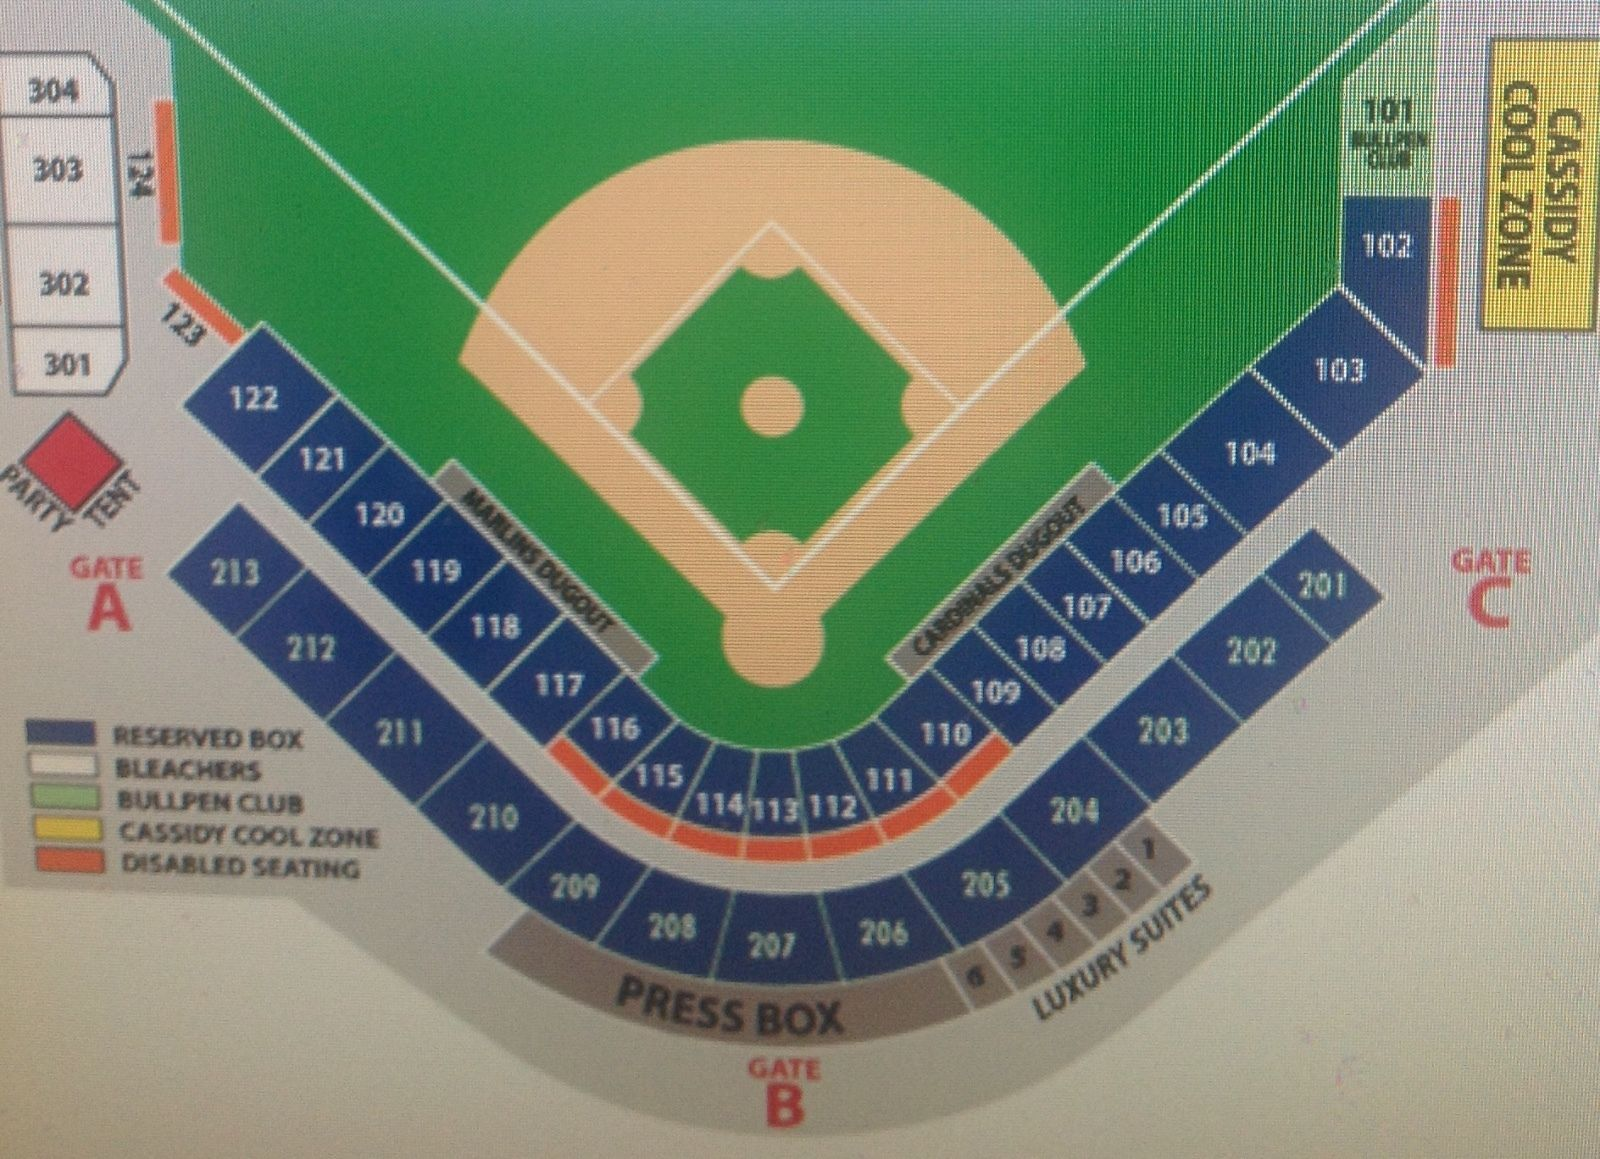 Tickets 2 Miami Marlins Vs Washington Nationals Sec 112 Row 4 Aisle Tickets 3 24 17 Tickets Miami Marlins Marlins New York Mets